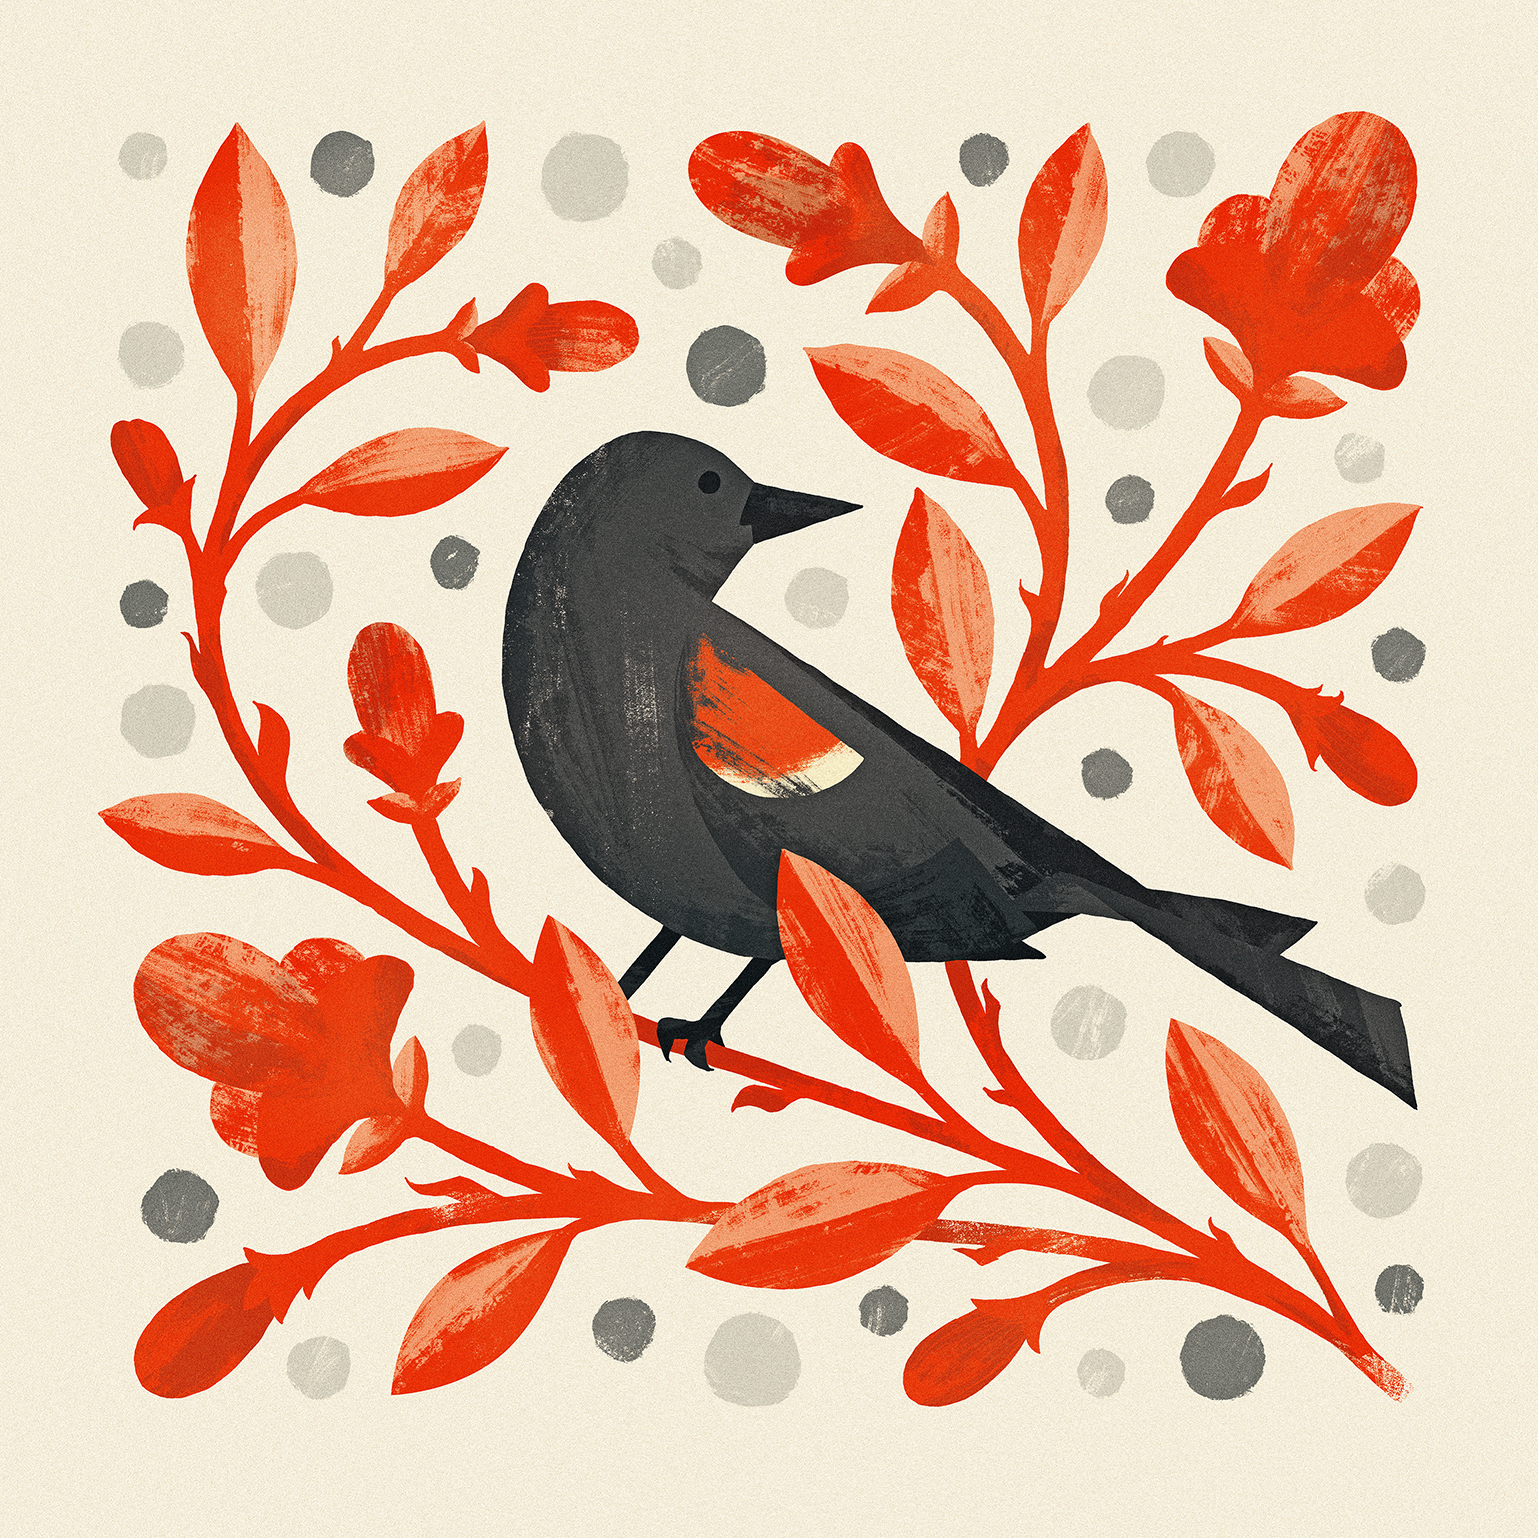 Red-Winged Blackbird Illustration